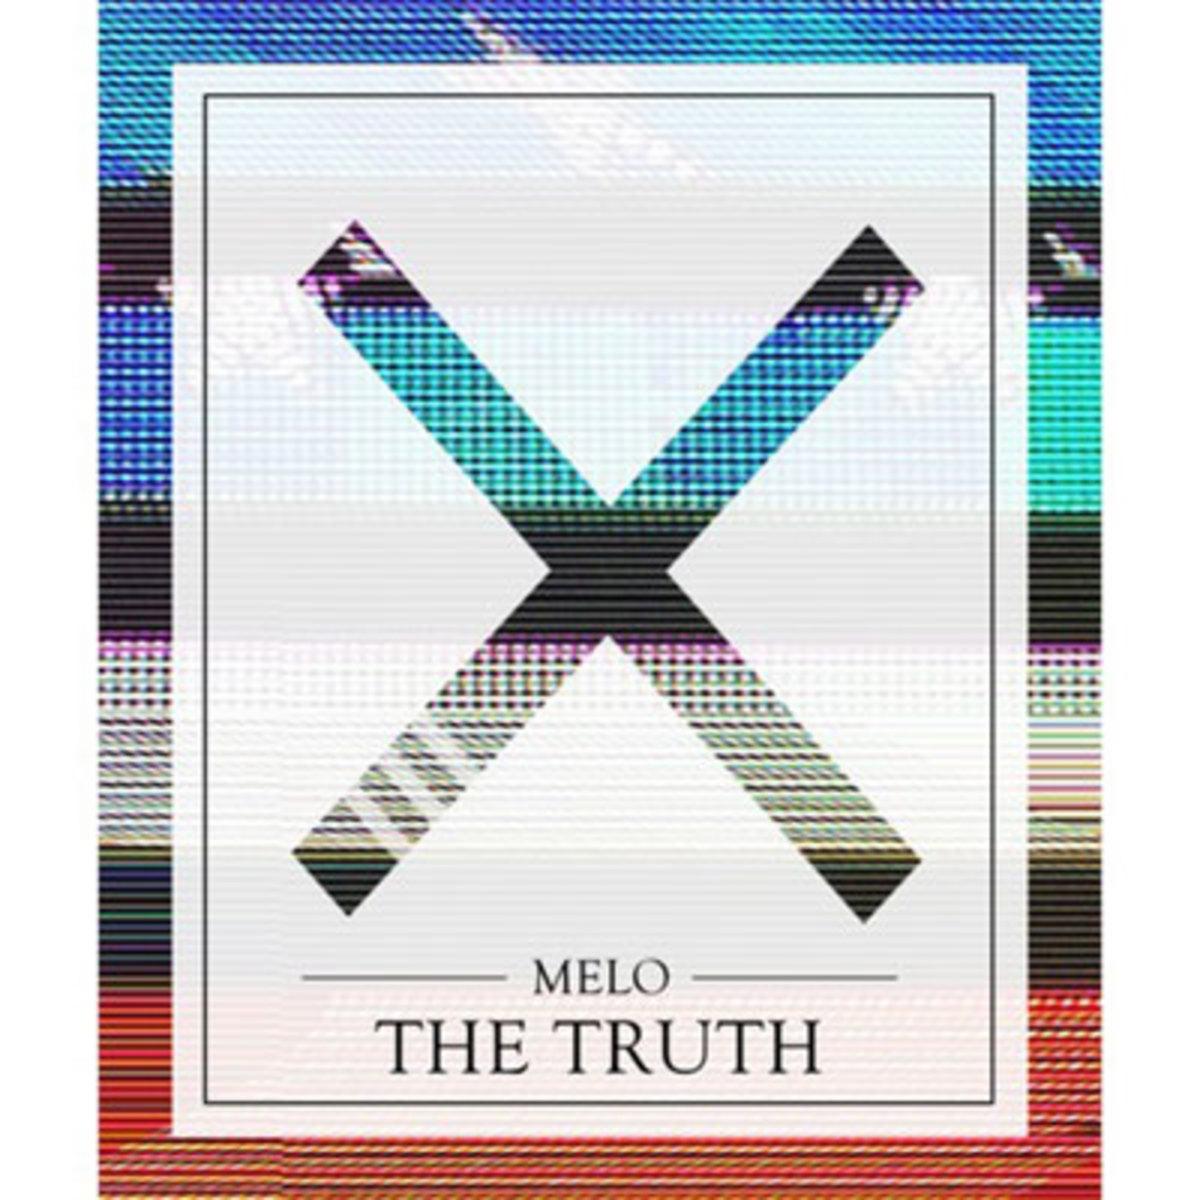 melox-thetruth.jpg